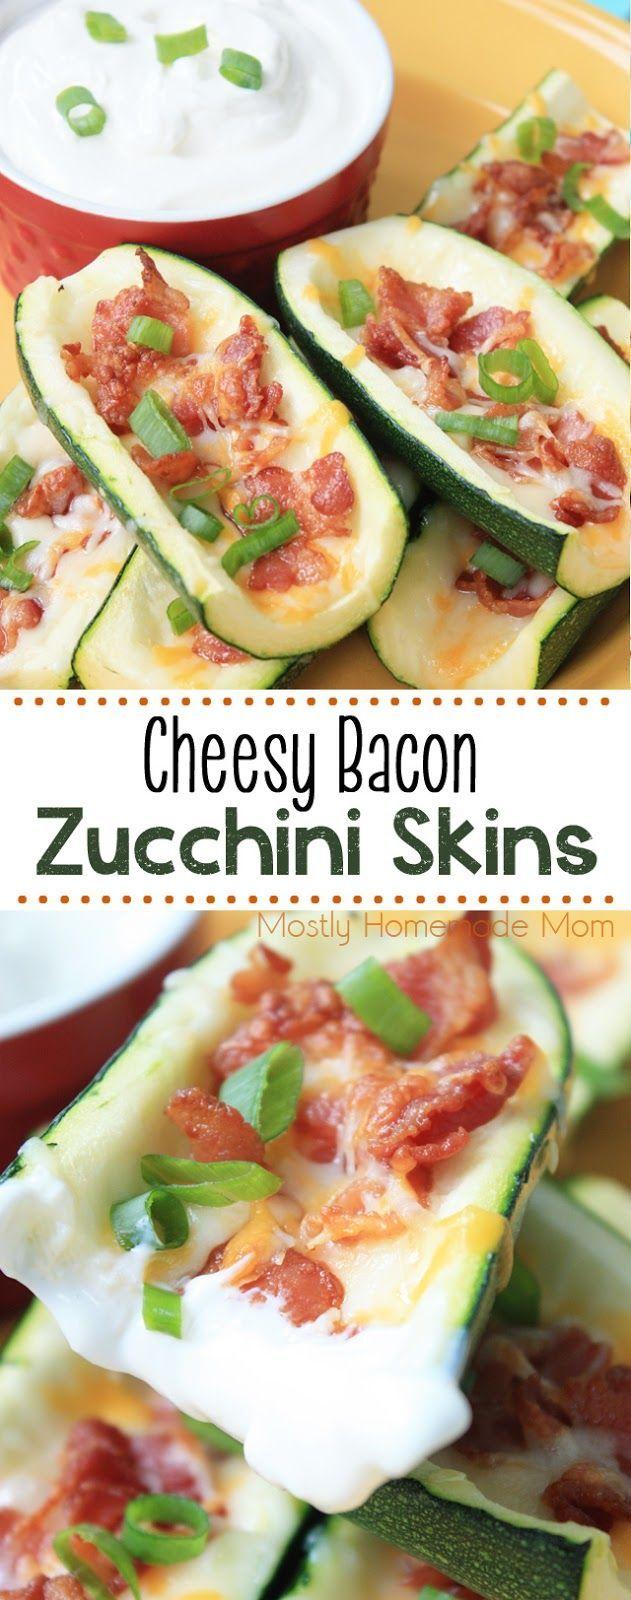 Mostly Homemade Mom: Cheesy Bacon Zucchini Skins